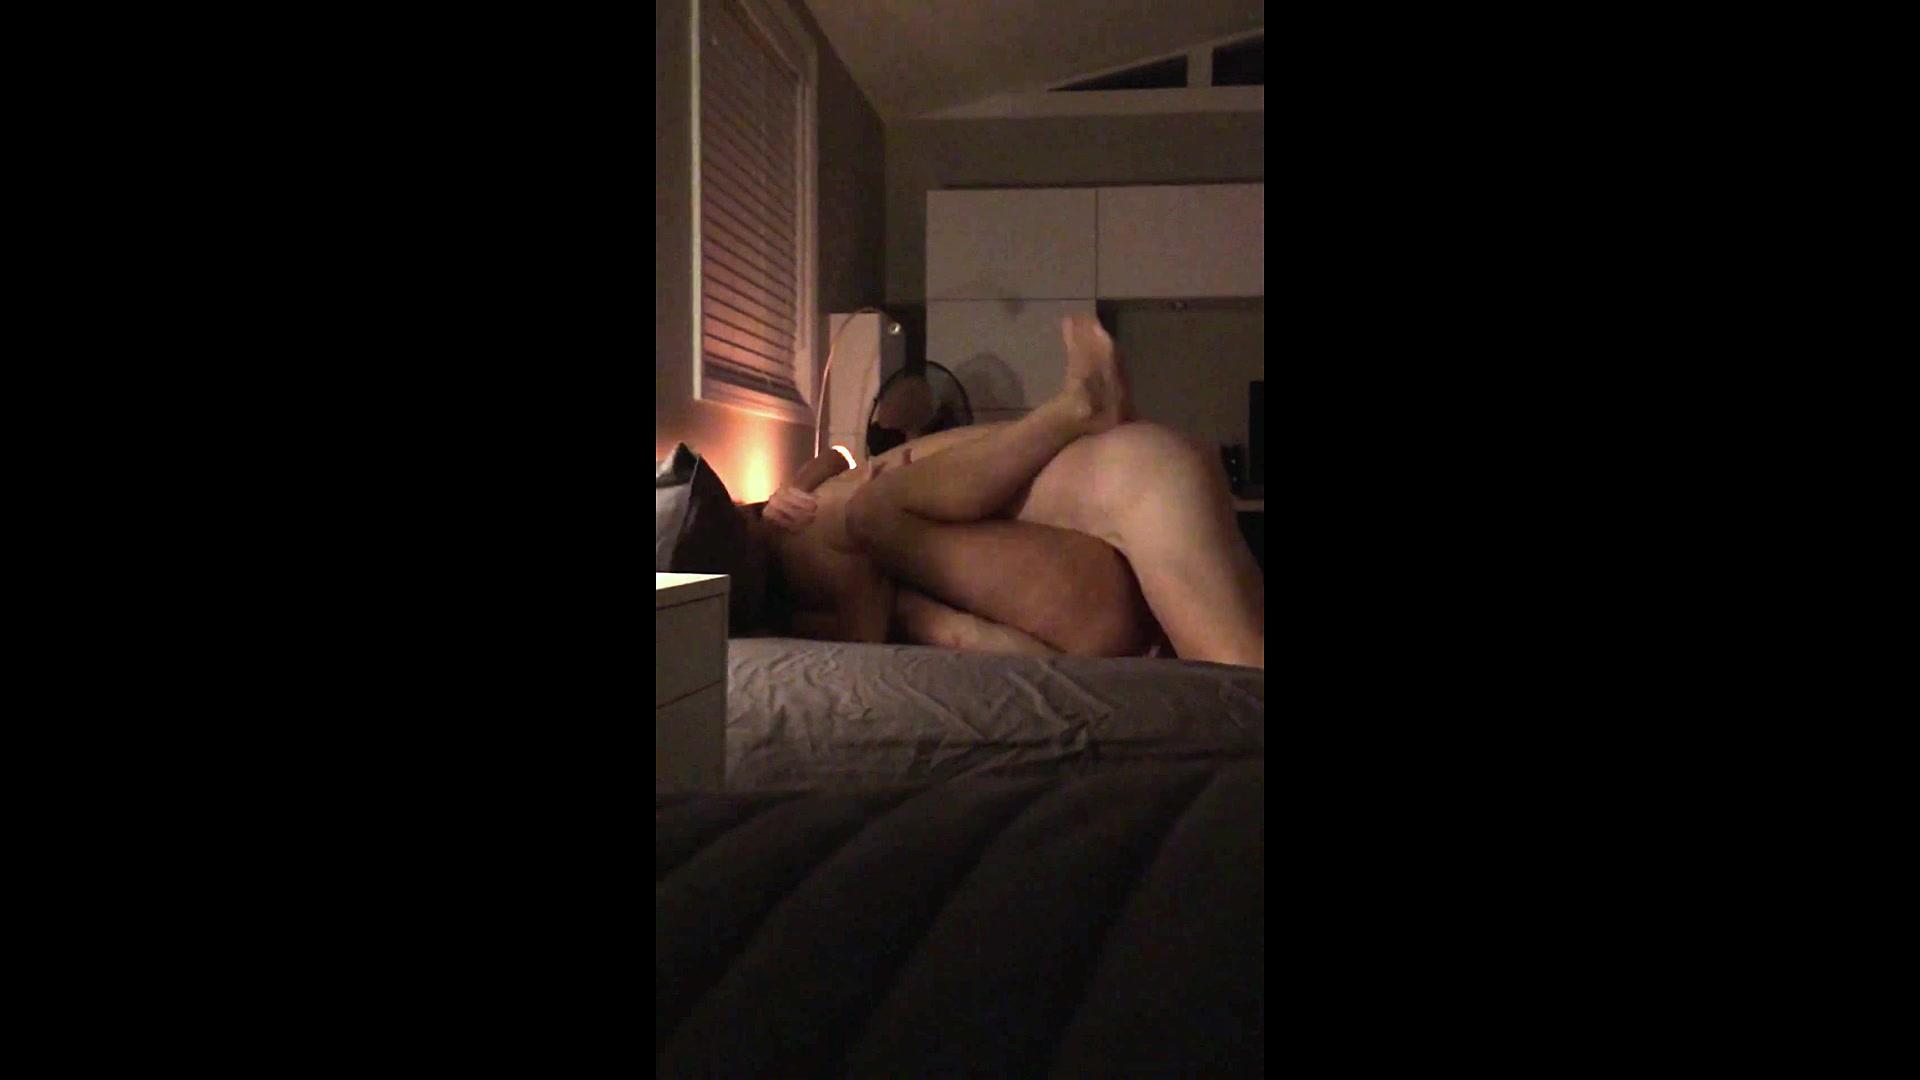 Amatuer wife cuckold no condom video